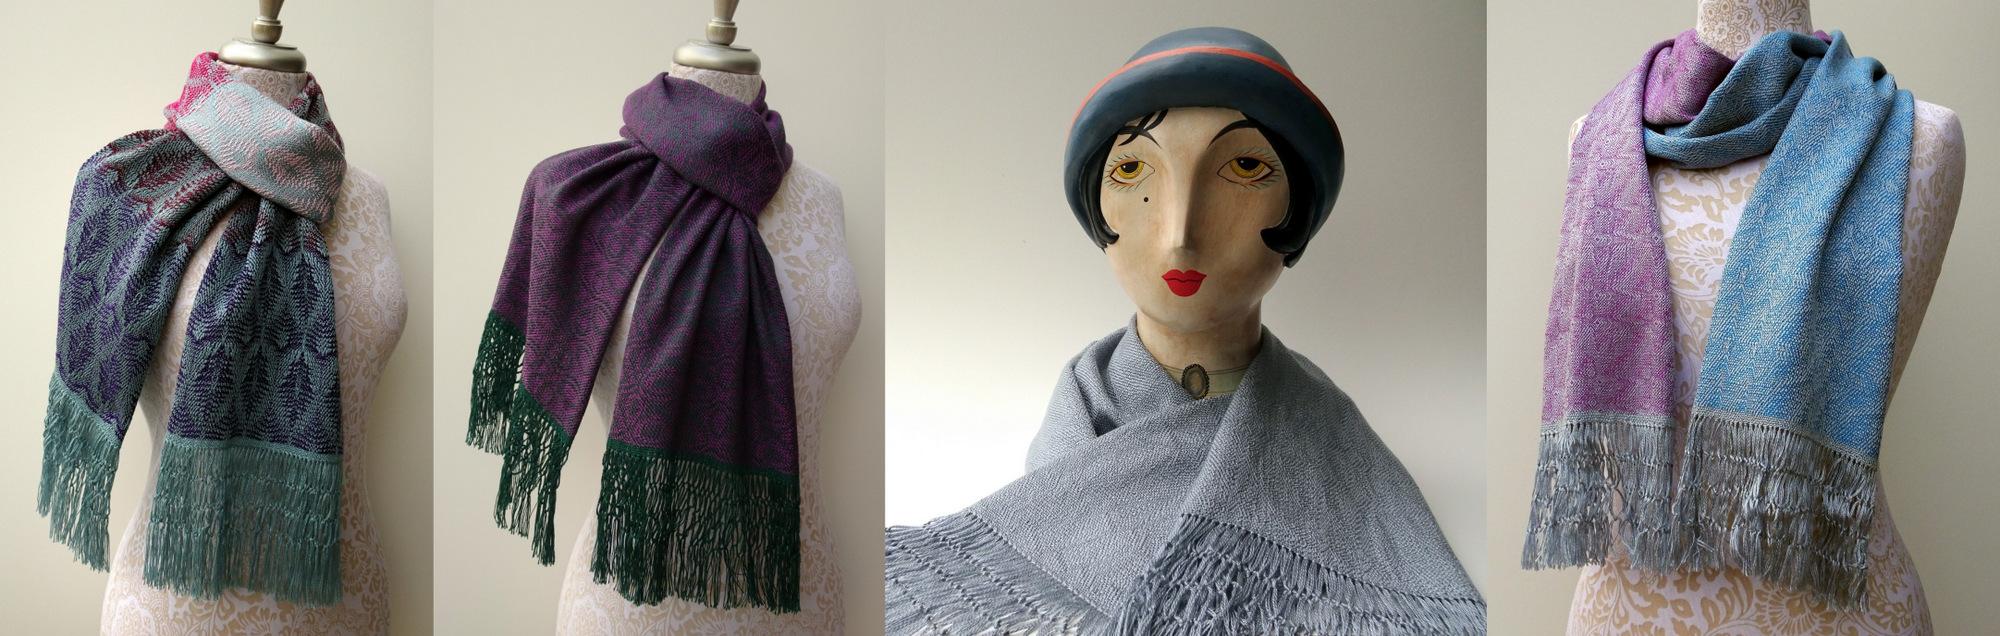 Paula Bowers, Handwoven Clothing and Home Decor-003.jpg